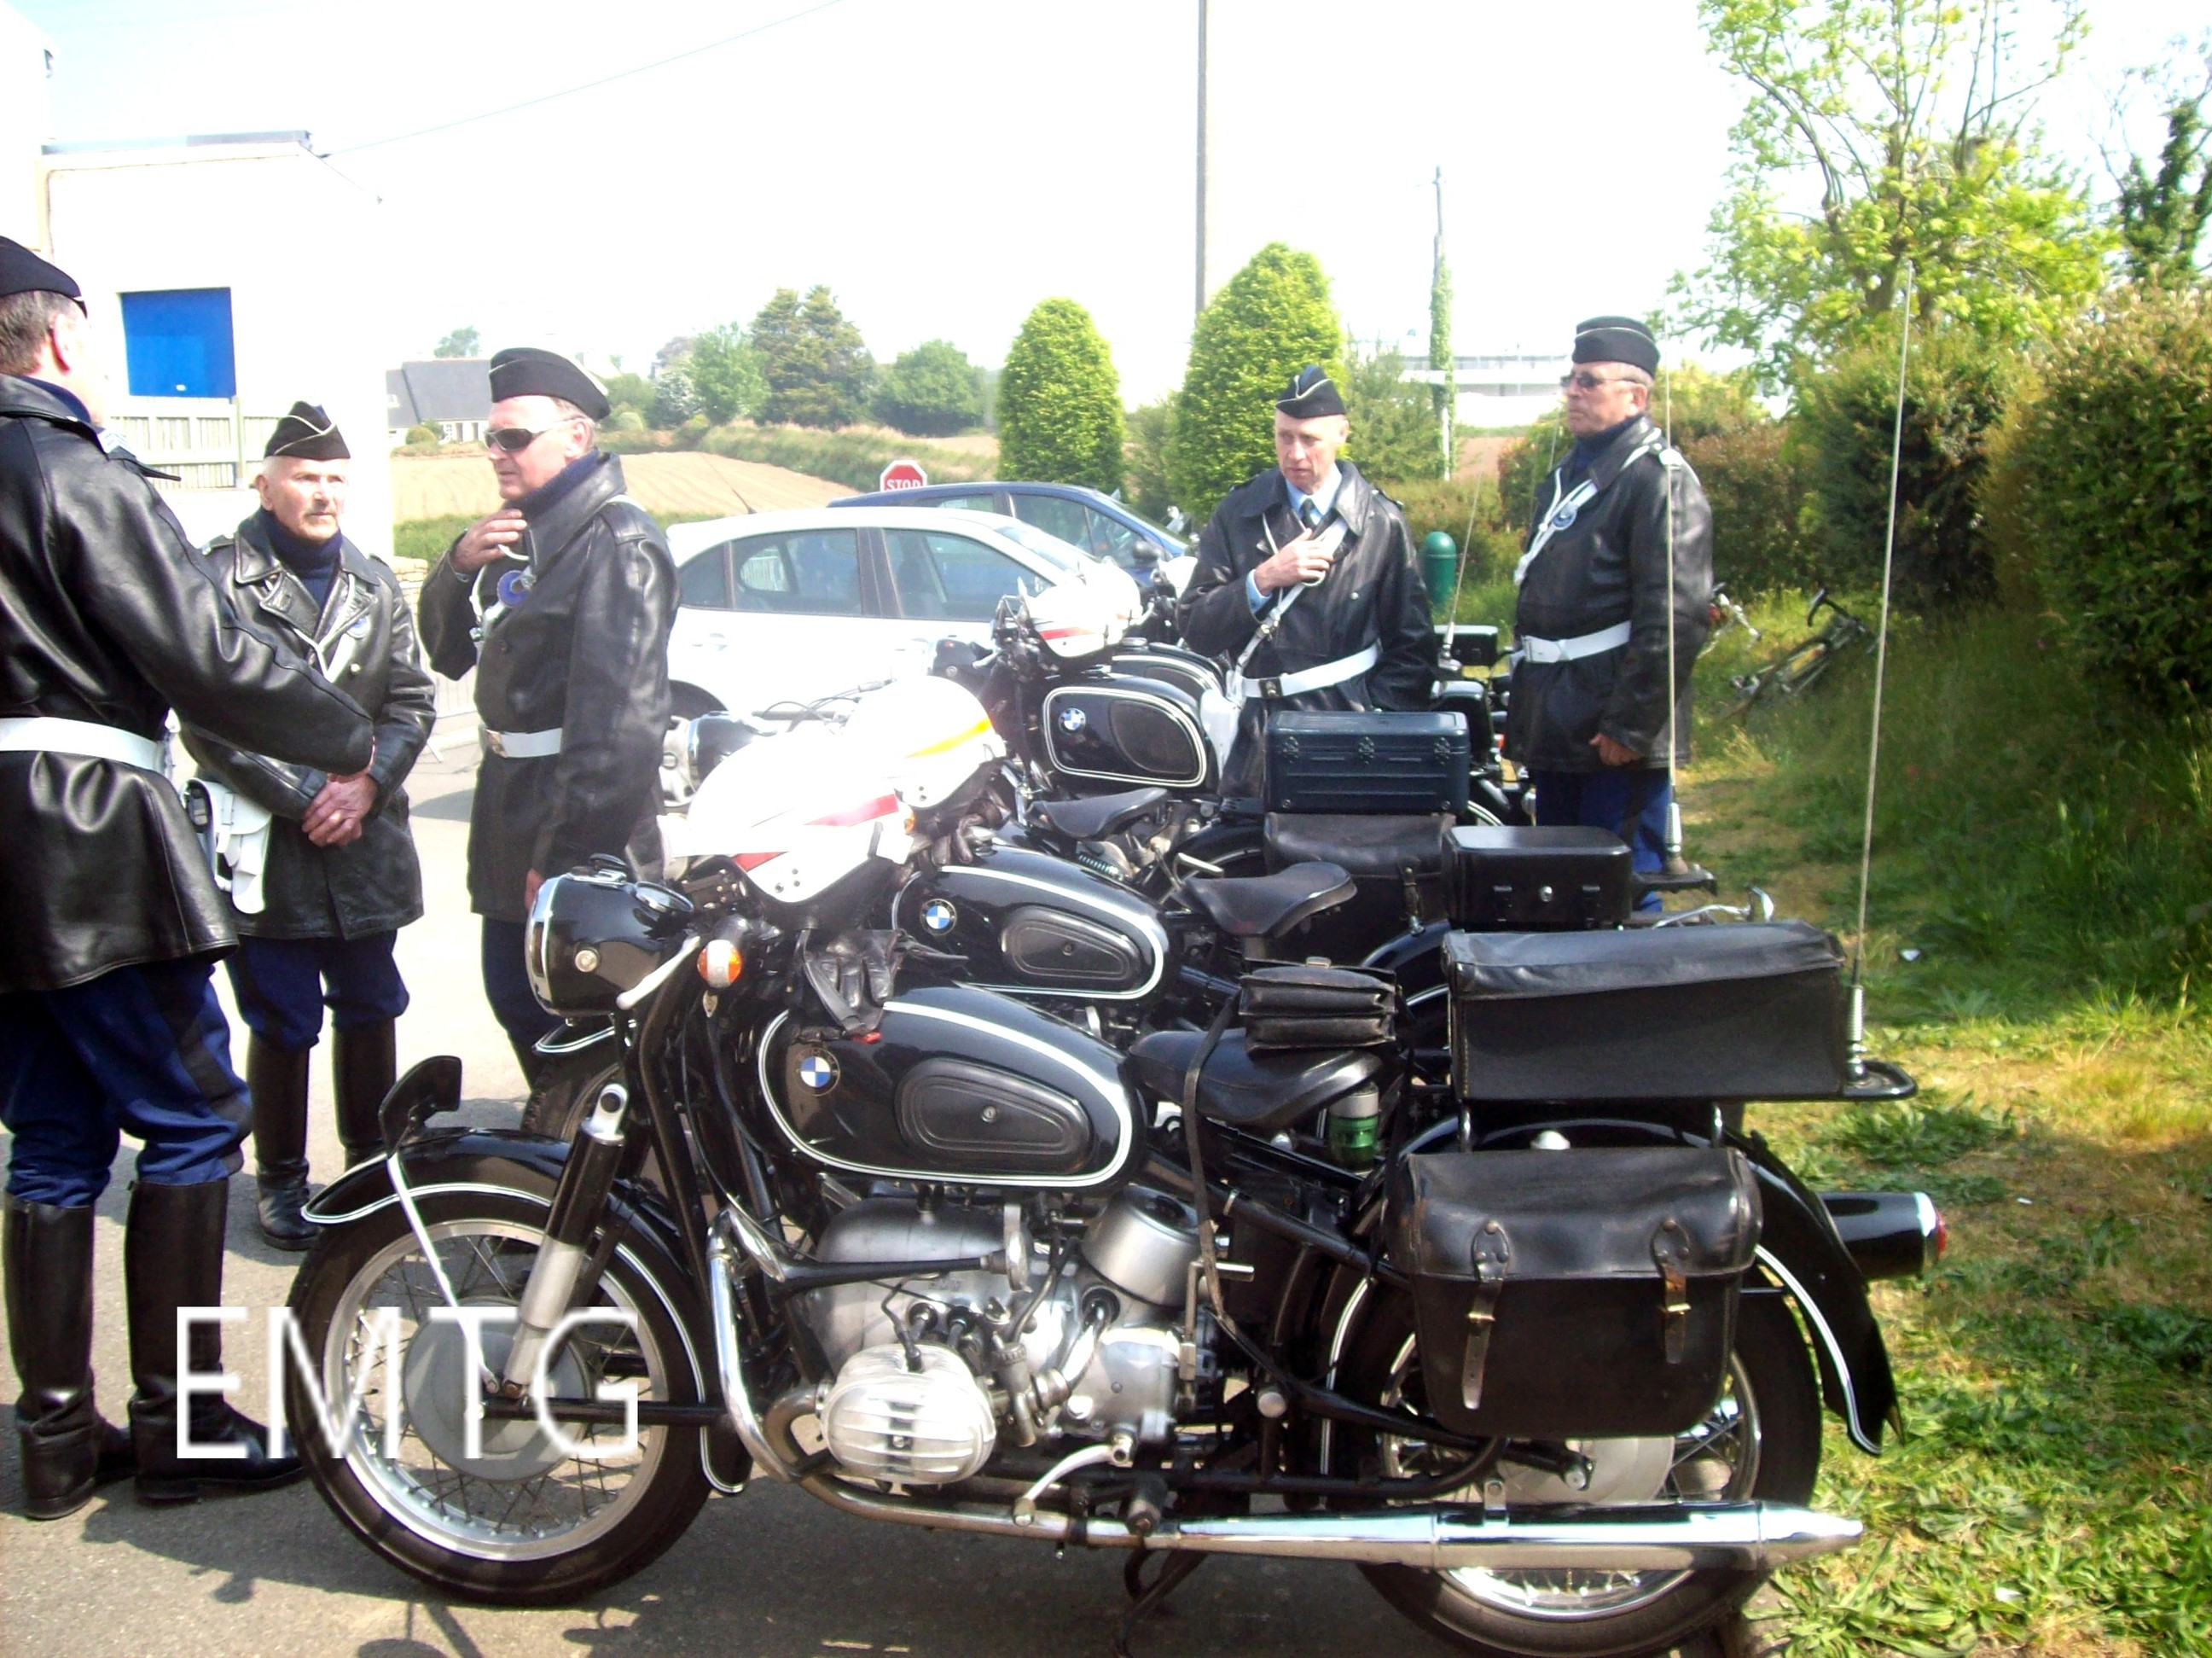 moto bmw r50 gendarmerie id es d 39 image de moto. Black Bedroom Furniture Sets. Home Design Ideas